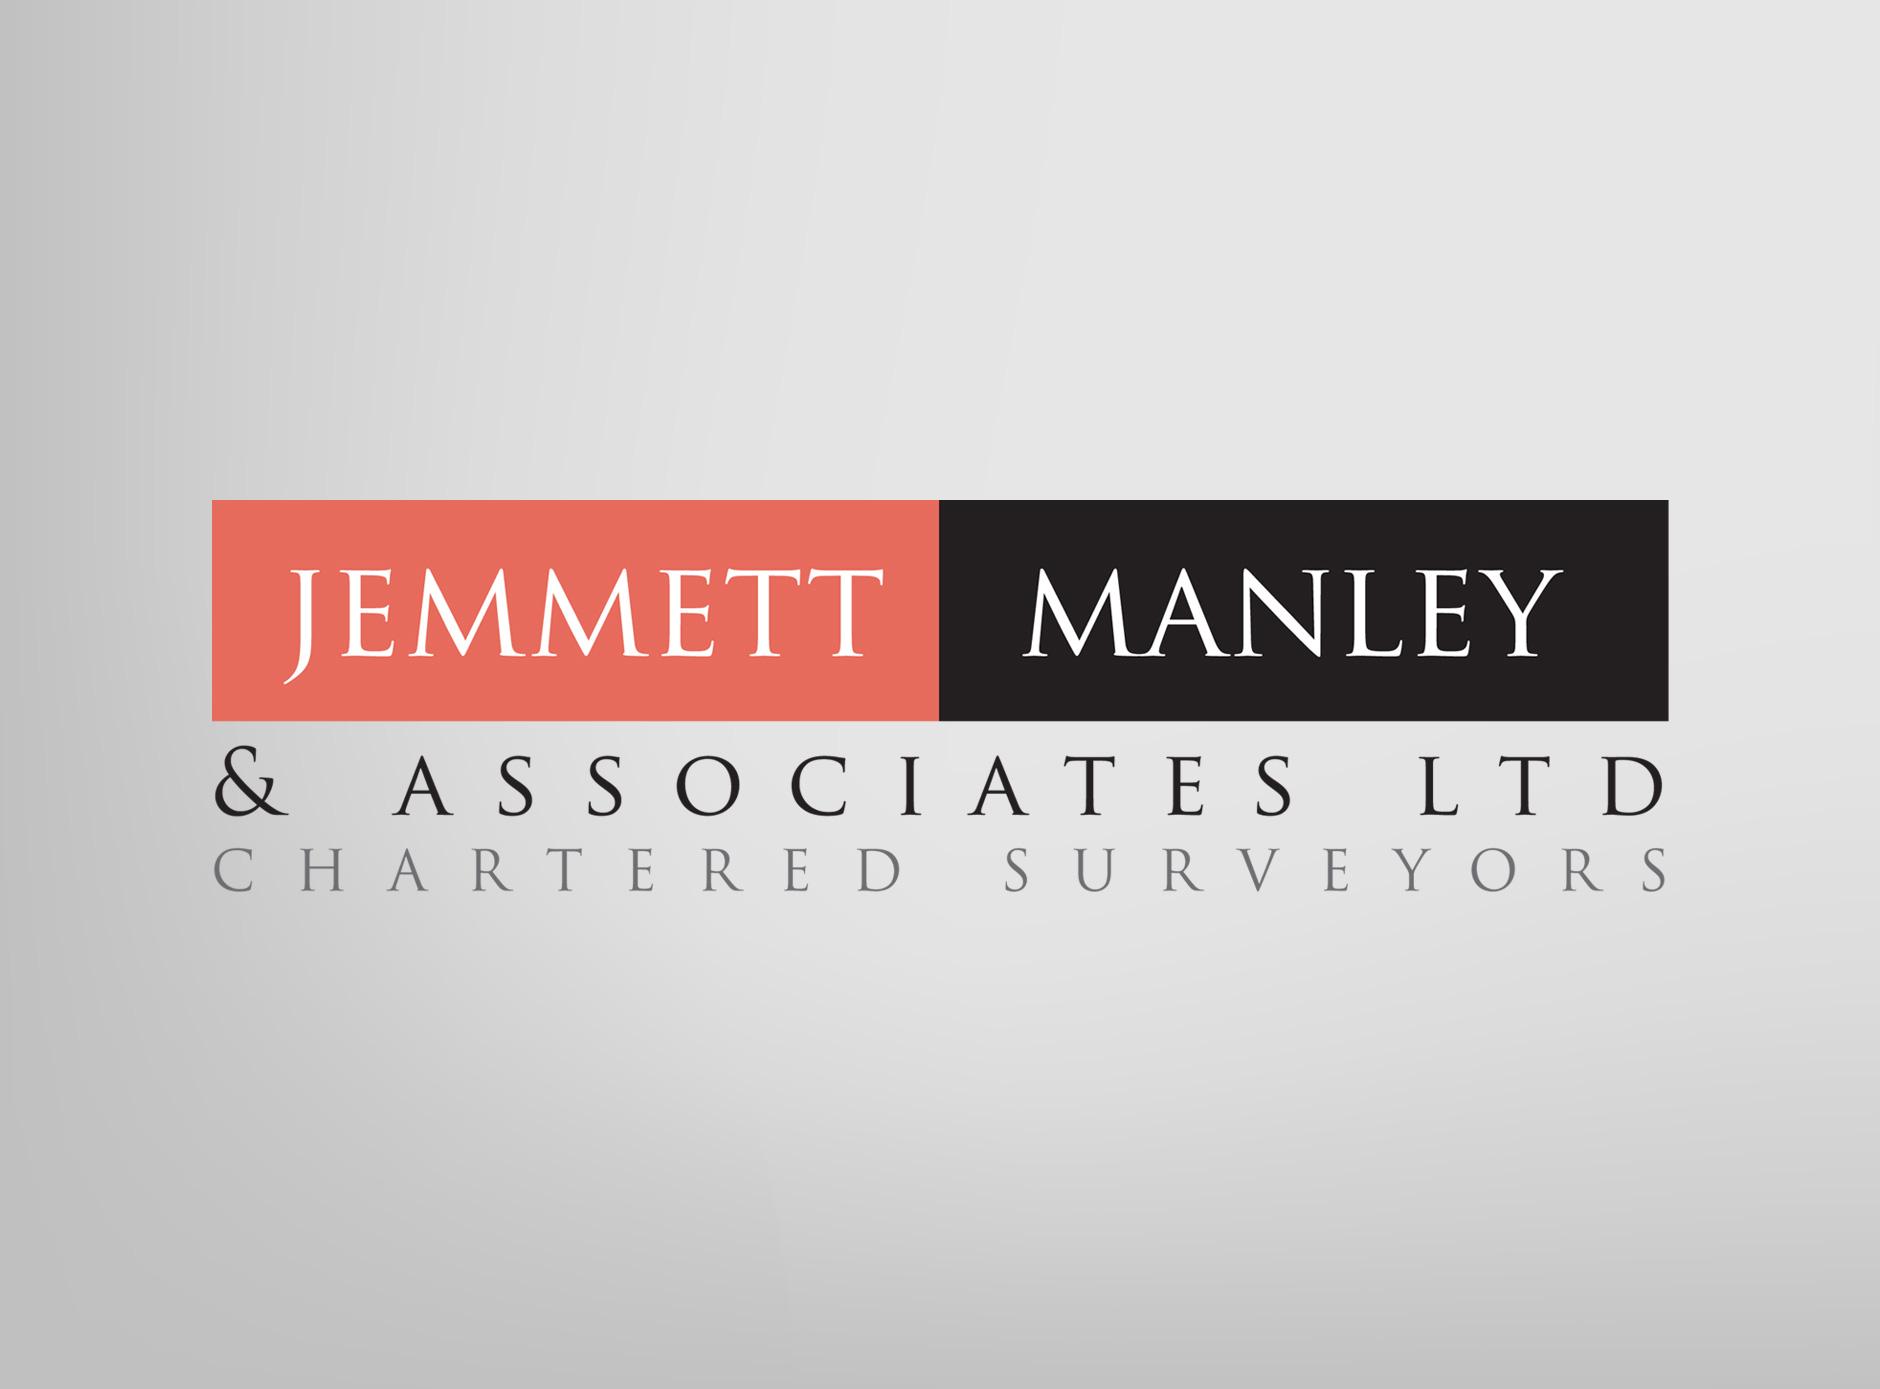 Jemmett Manley identity